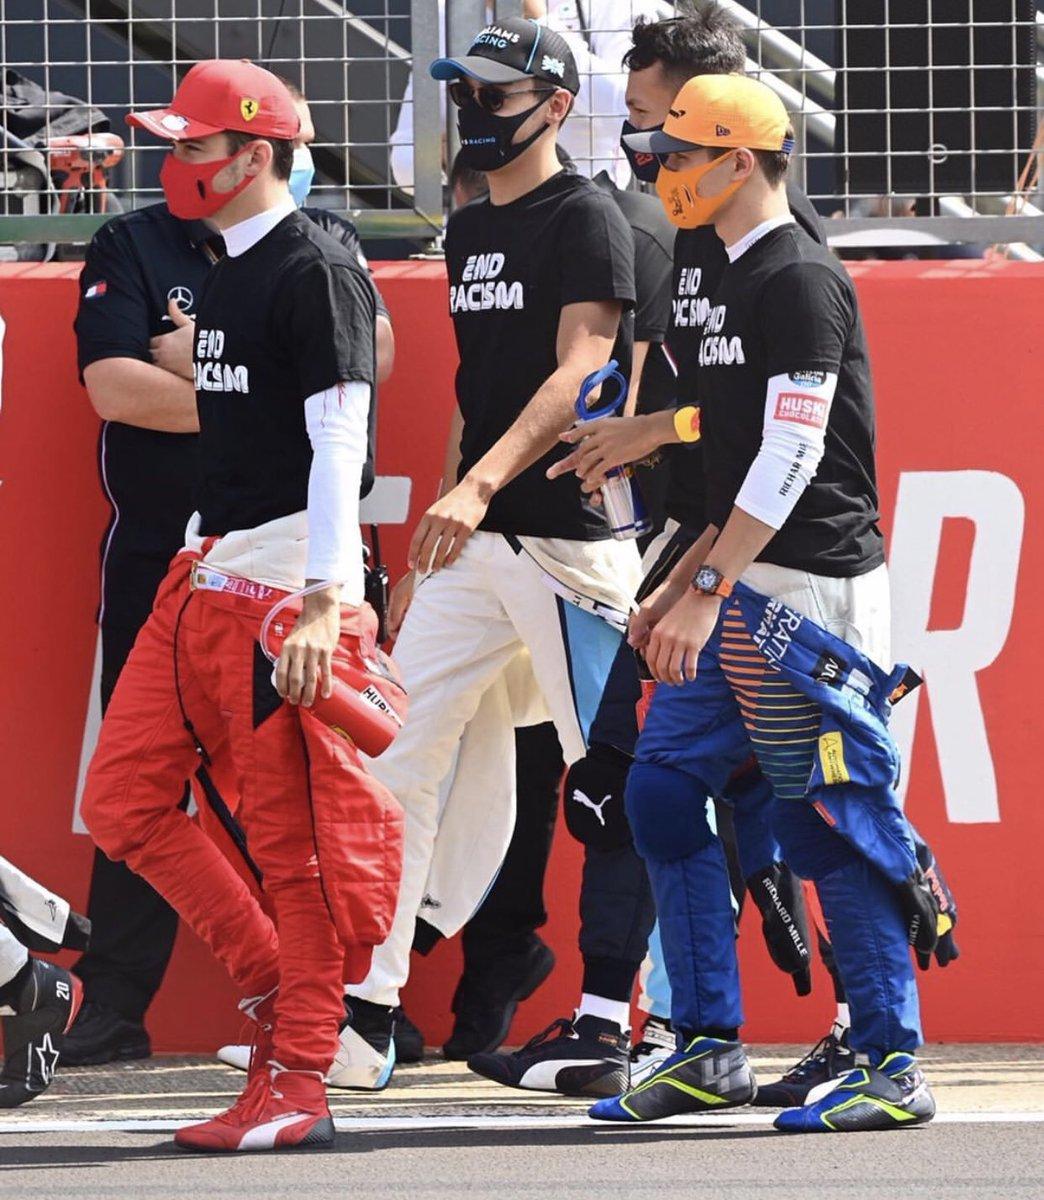 📸 | Lando before the race yesterday!   (Via @f1sutton on Instagram) #L4NDO #LN4 #F1 #F170 🇬🇧 https://t.co/aqZryyDNxd